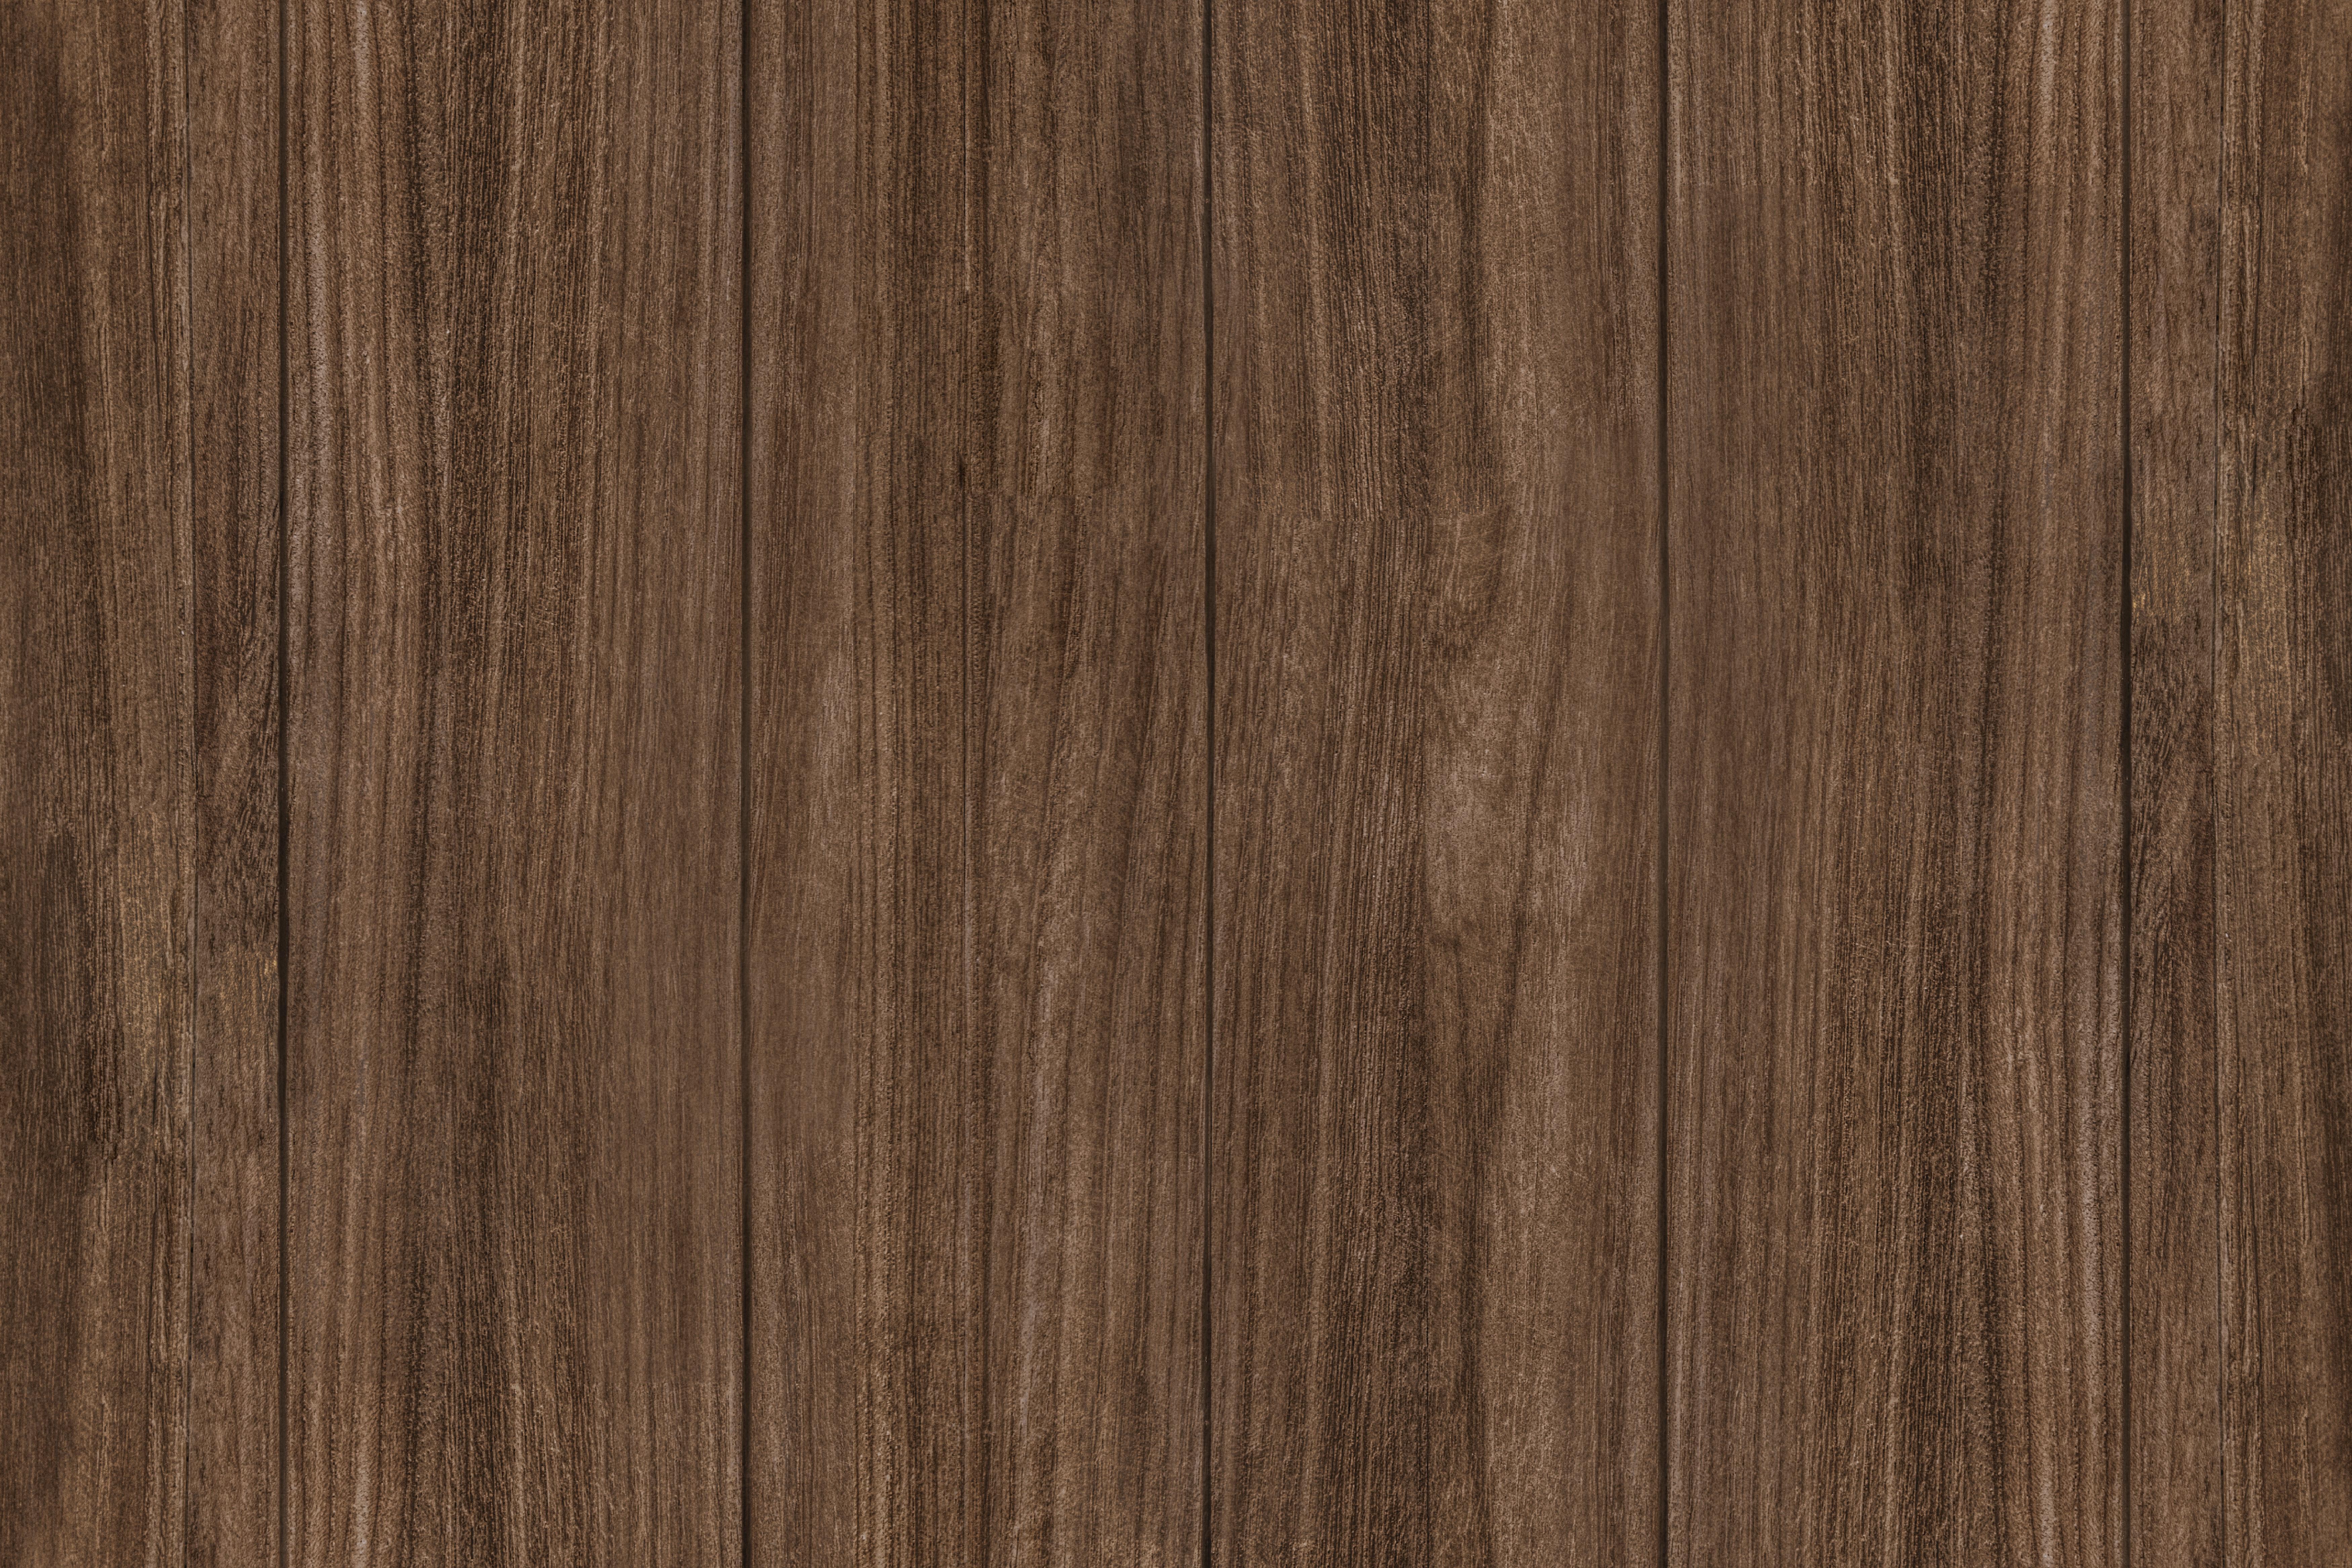 Wood Texture Wallpapers - Wallpaper Cave